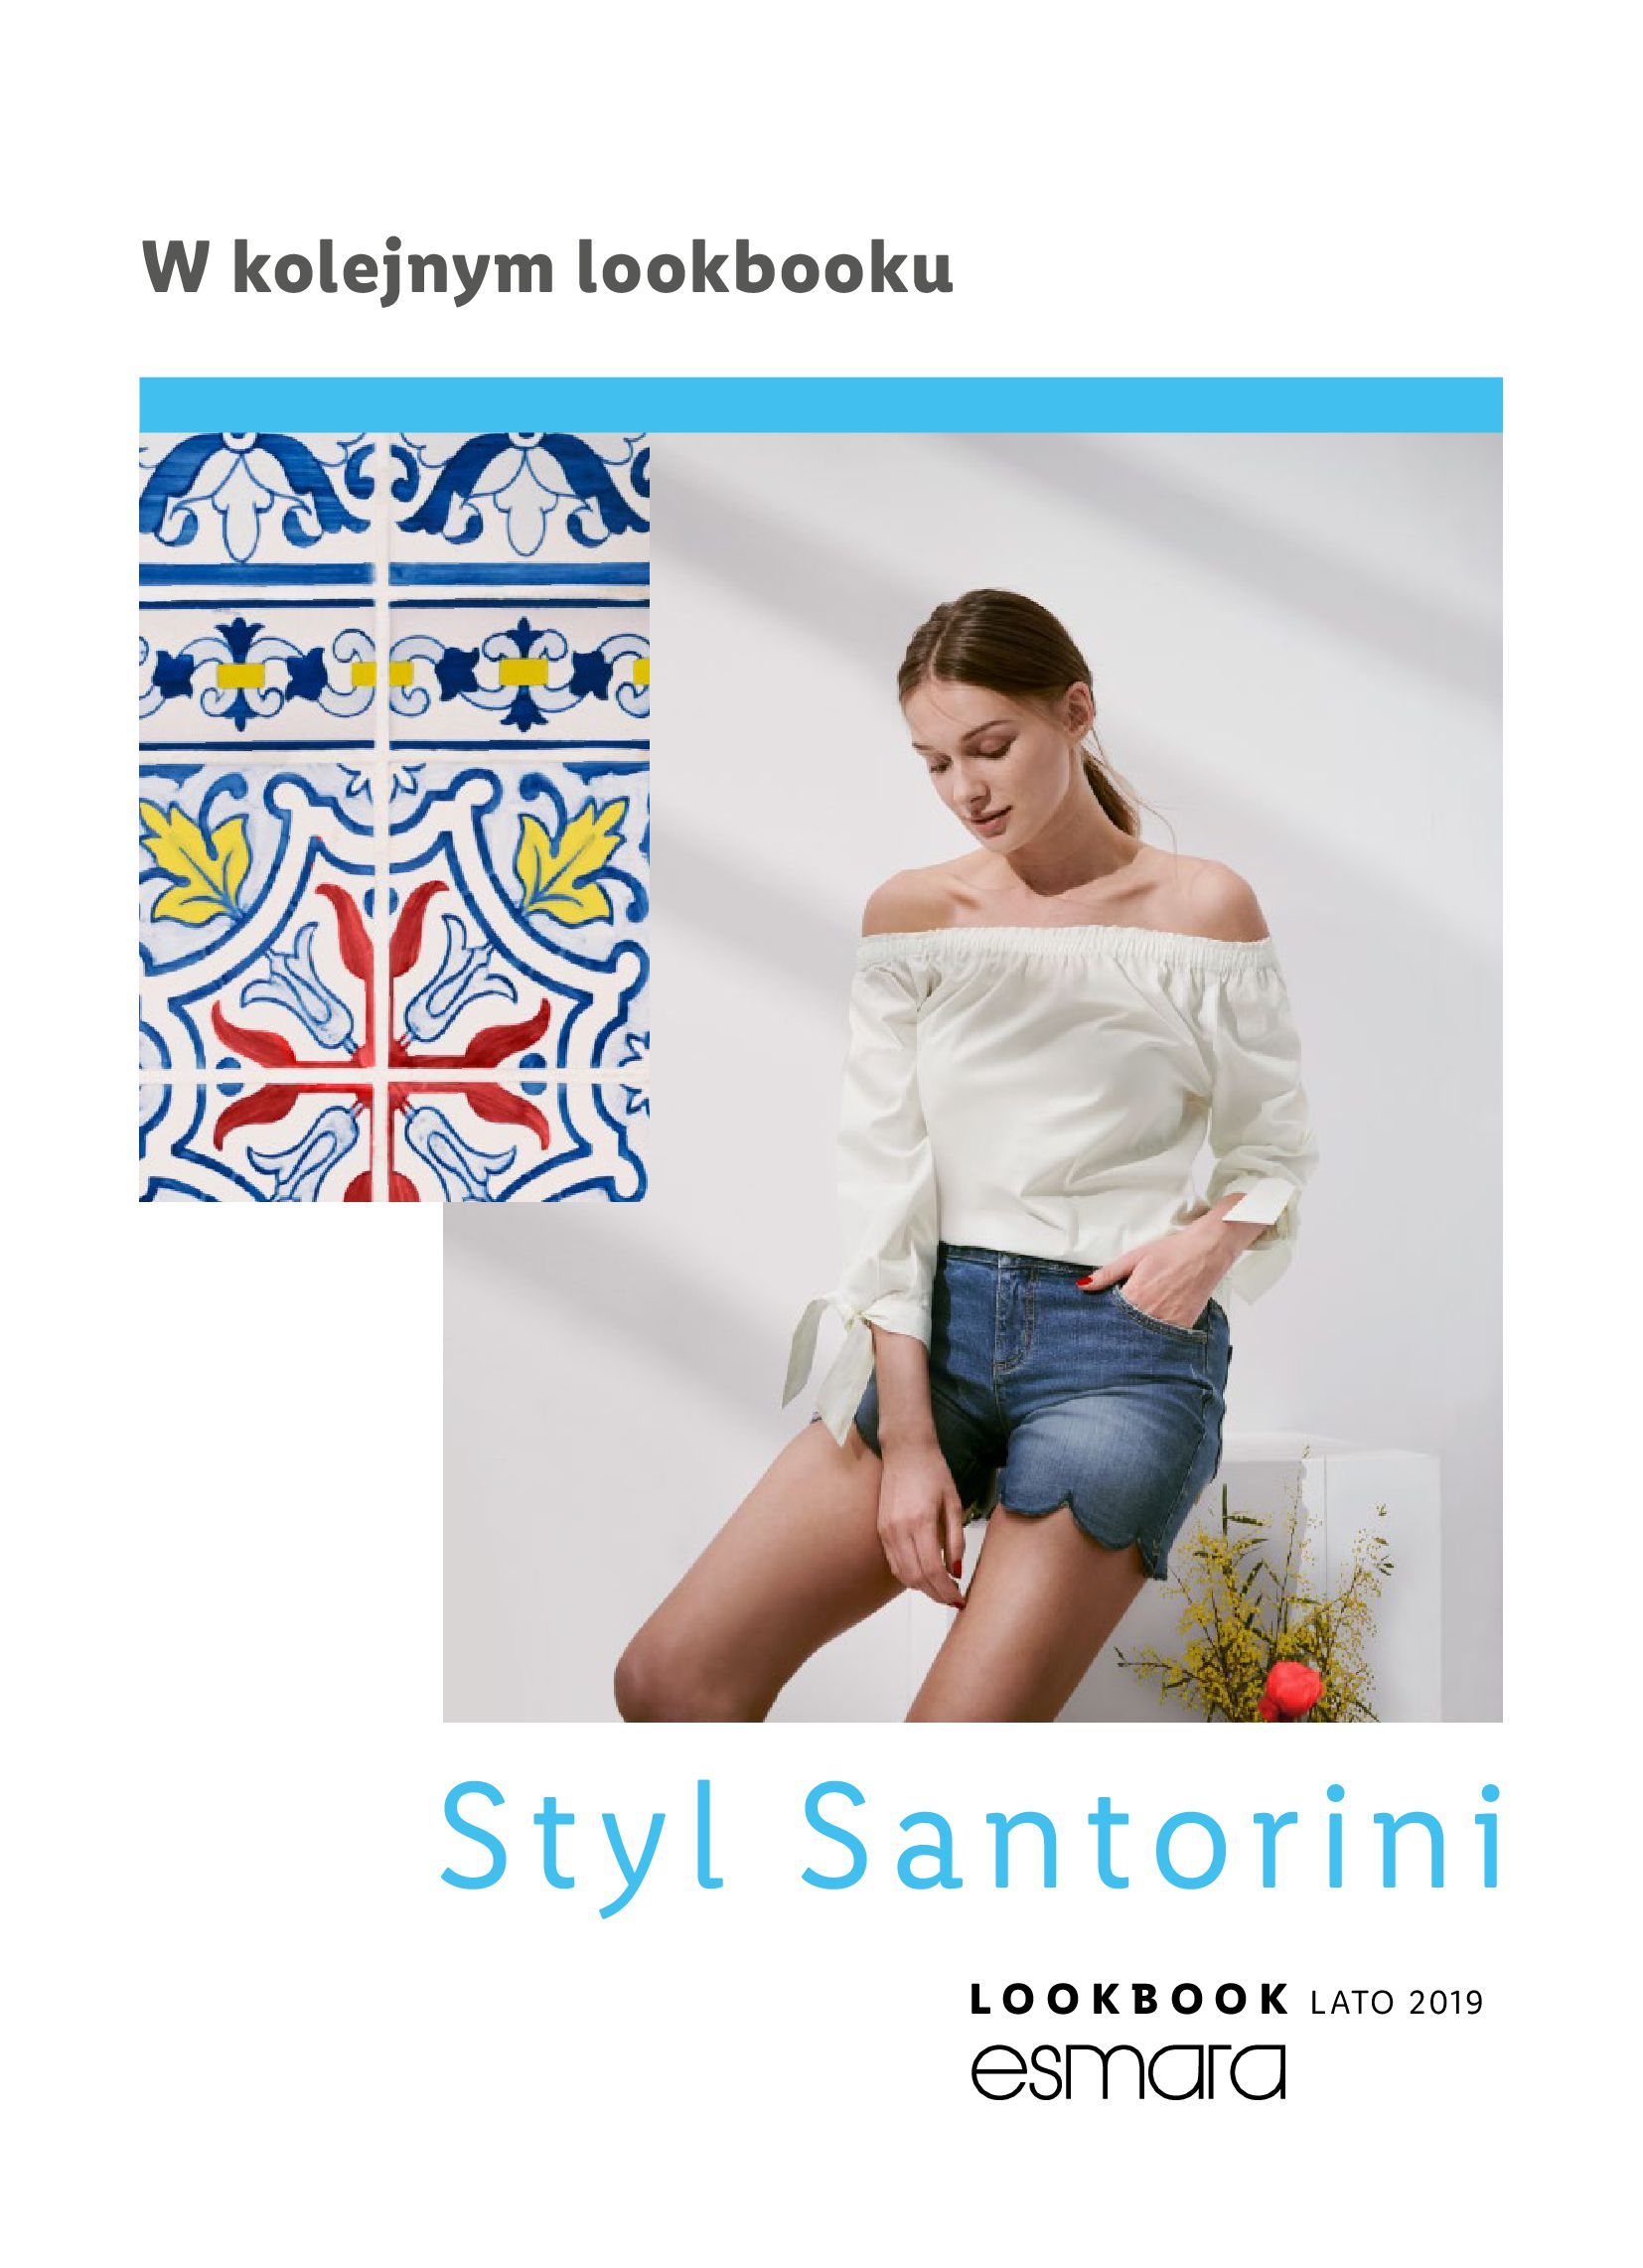 Gazetka Lidl - Lookbook -  Lato 2019 Styl Boho-02.06.2019-30.06.2019-page-